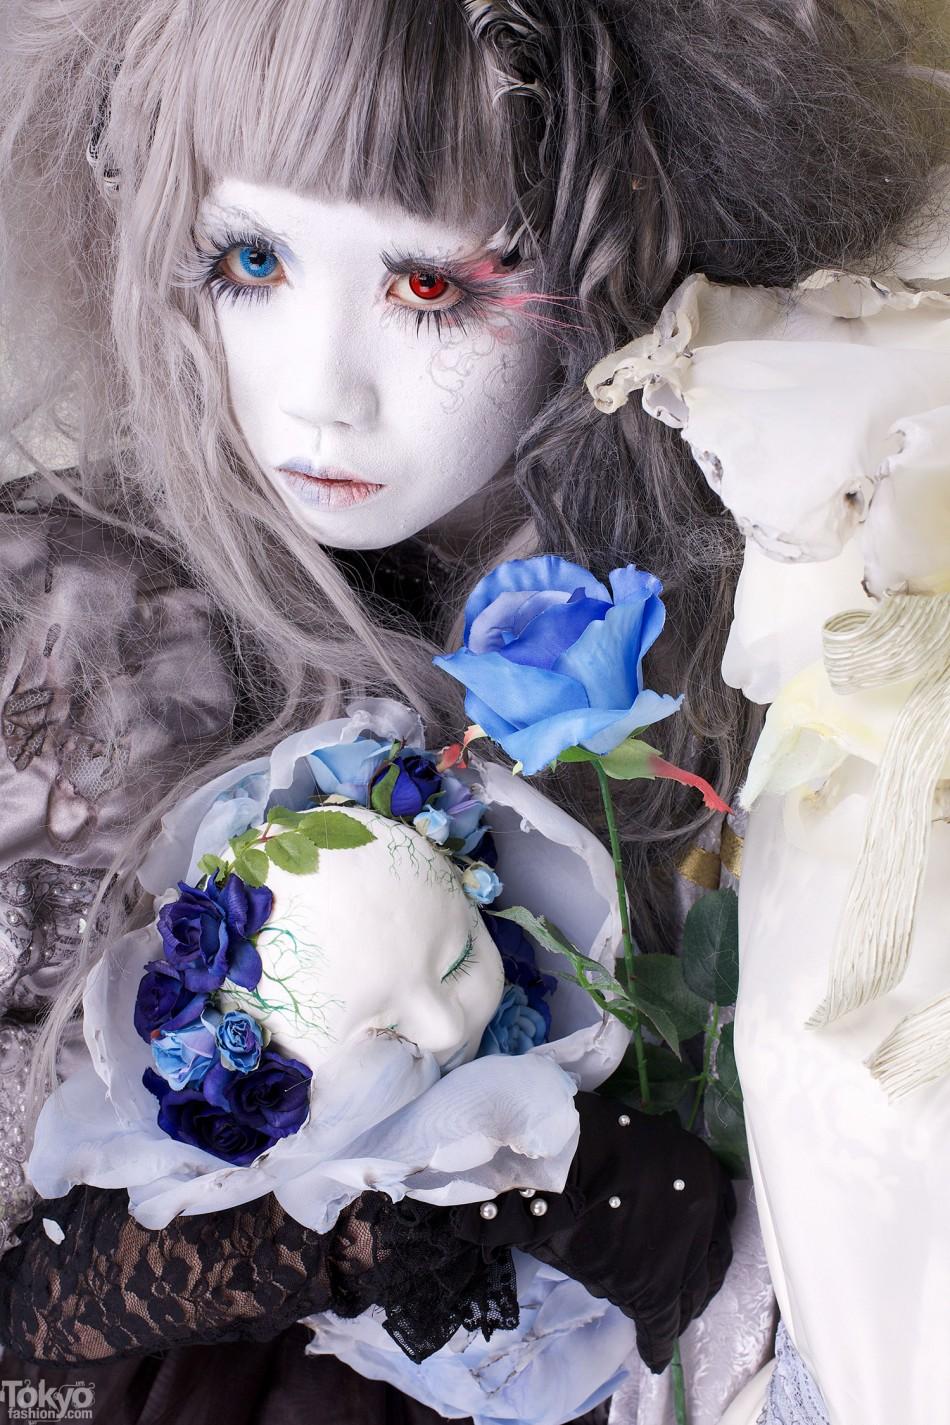 Minori - Her Memories of a Dream (16)